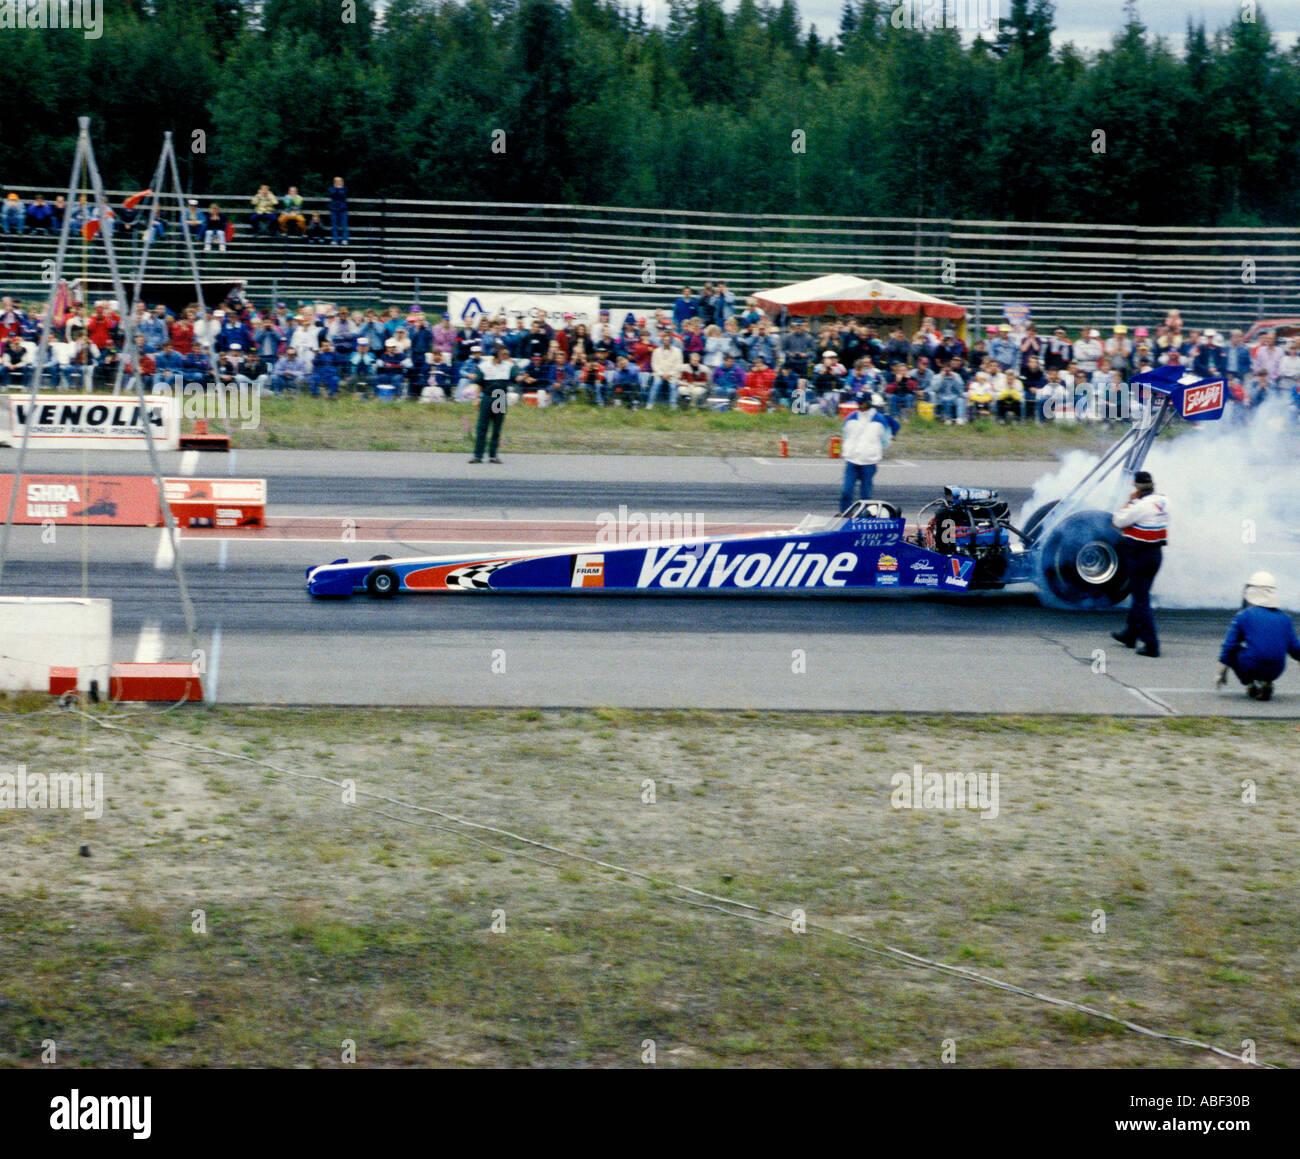 Viveca Averstadts Valvoline Top Fuel Dragster At Pitea Dragway In Northern Sweden